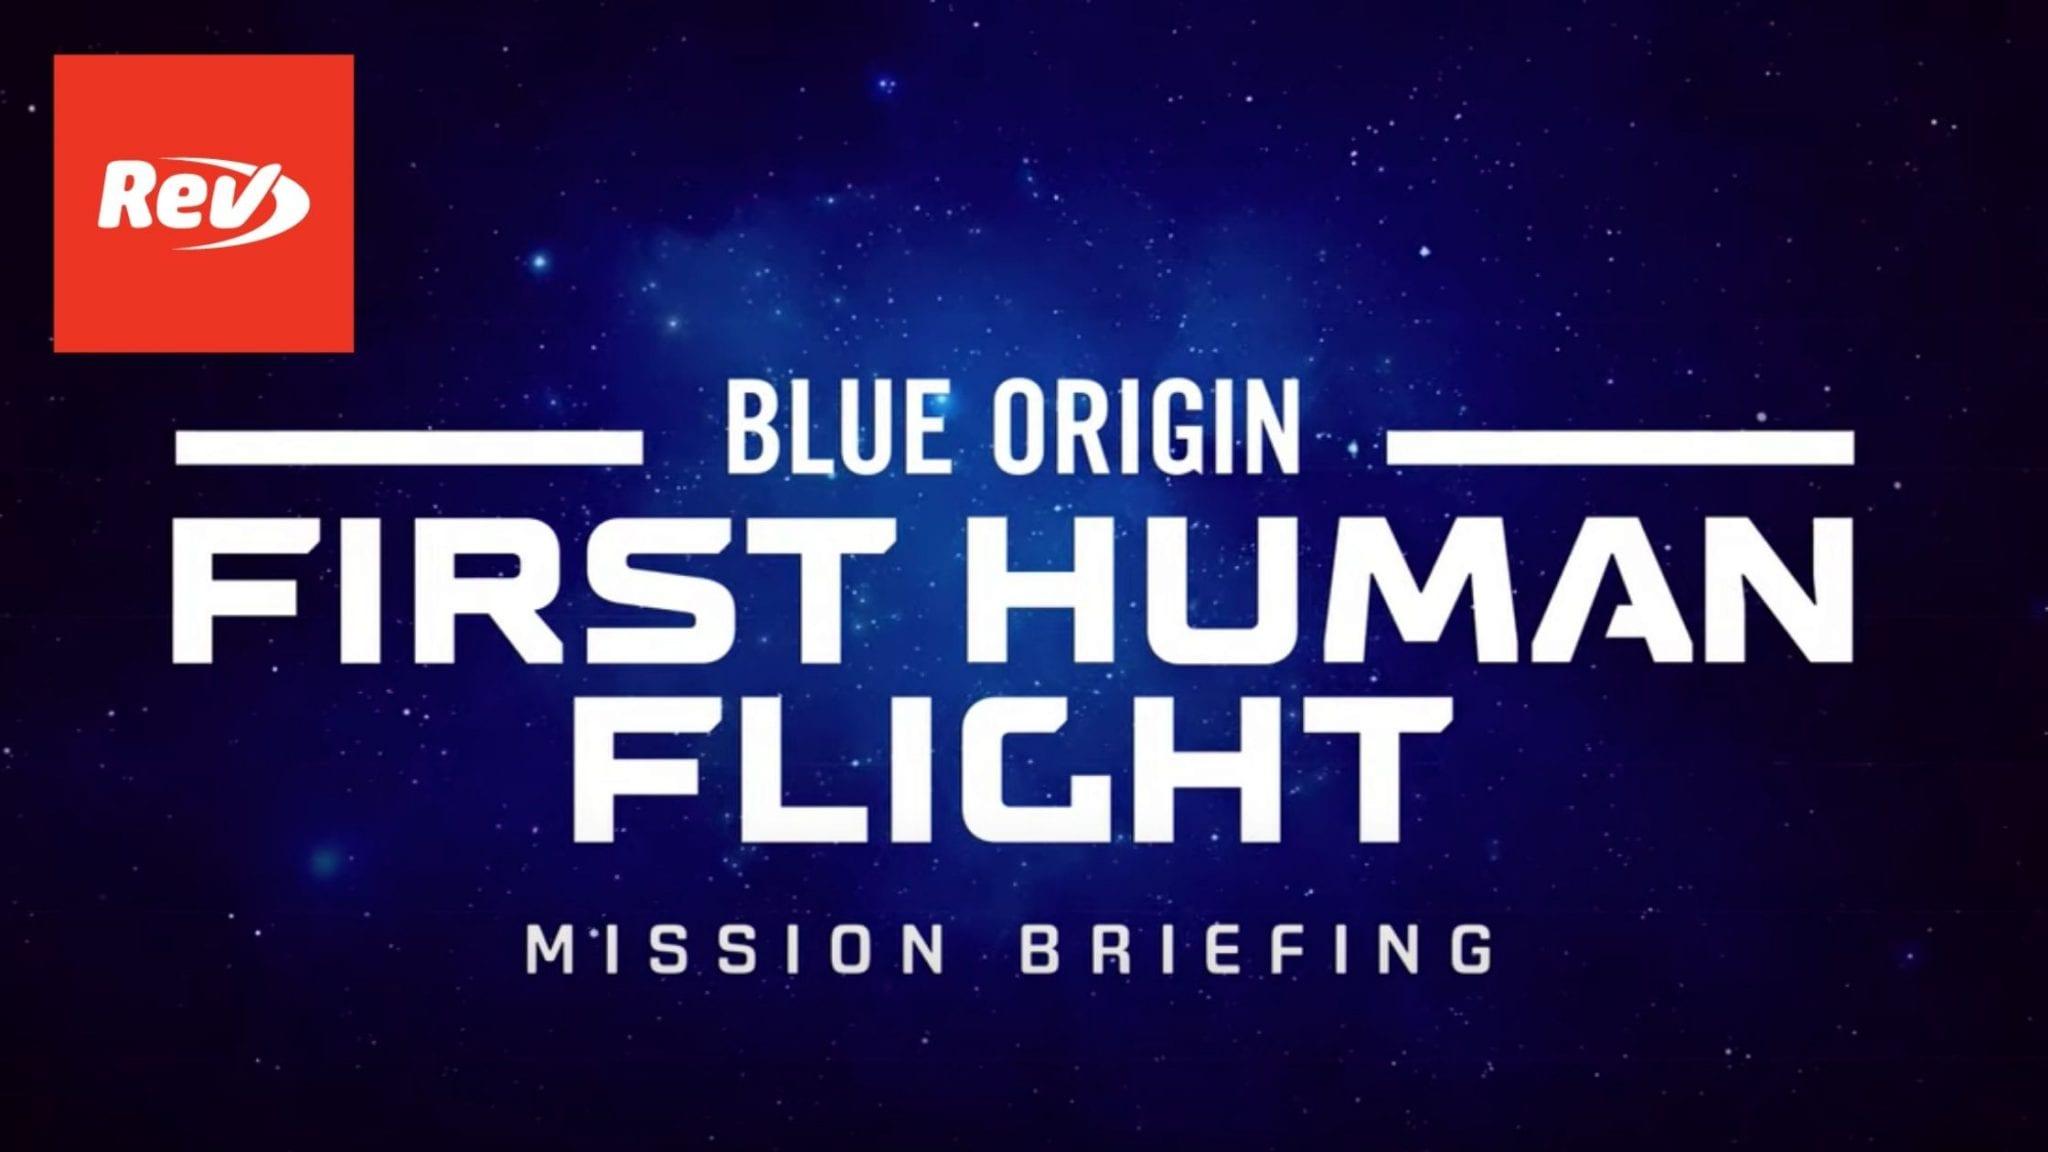 Blue Origin First Human Flight Jeff Bezos Mission Briefing Transcript